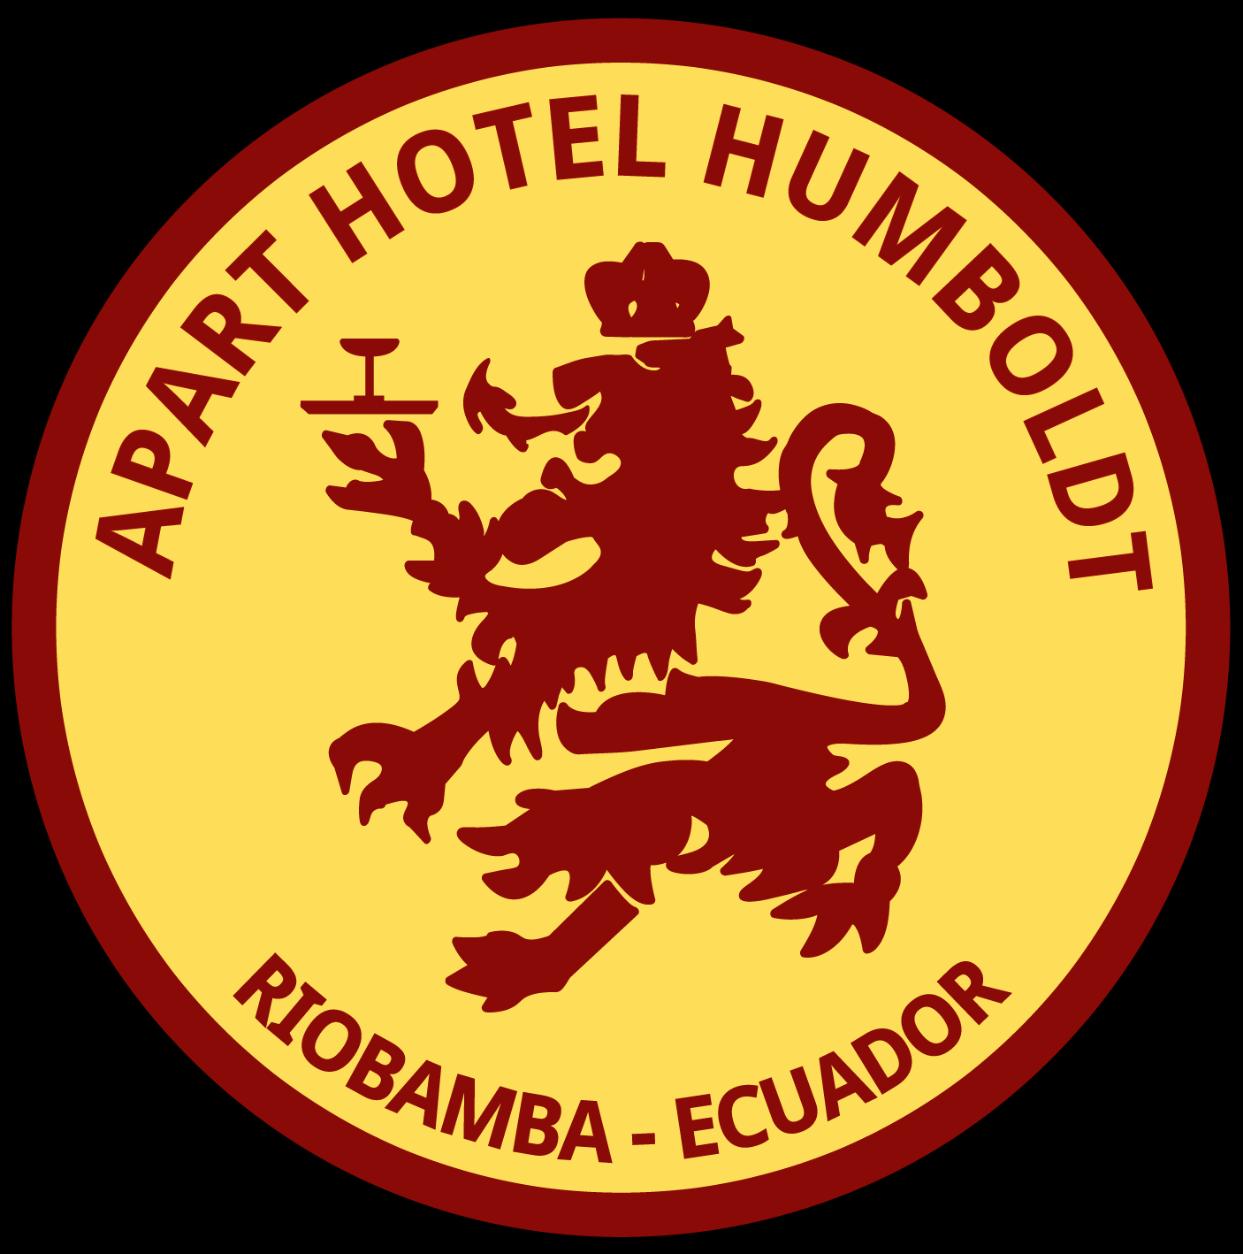 Apart hotel humboldt hospedaje riobamba for Appart hotel urban lodge chaudfontaine